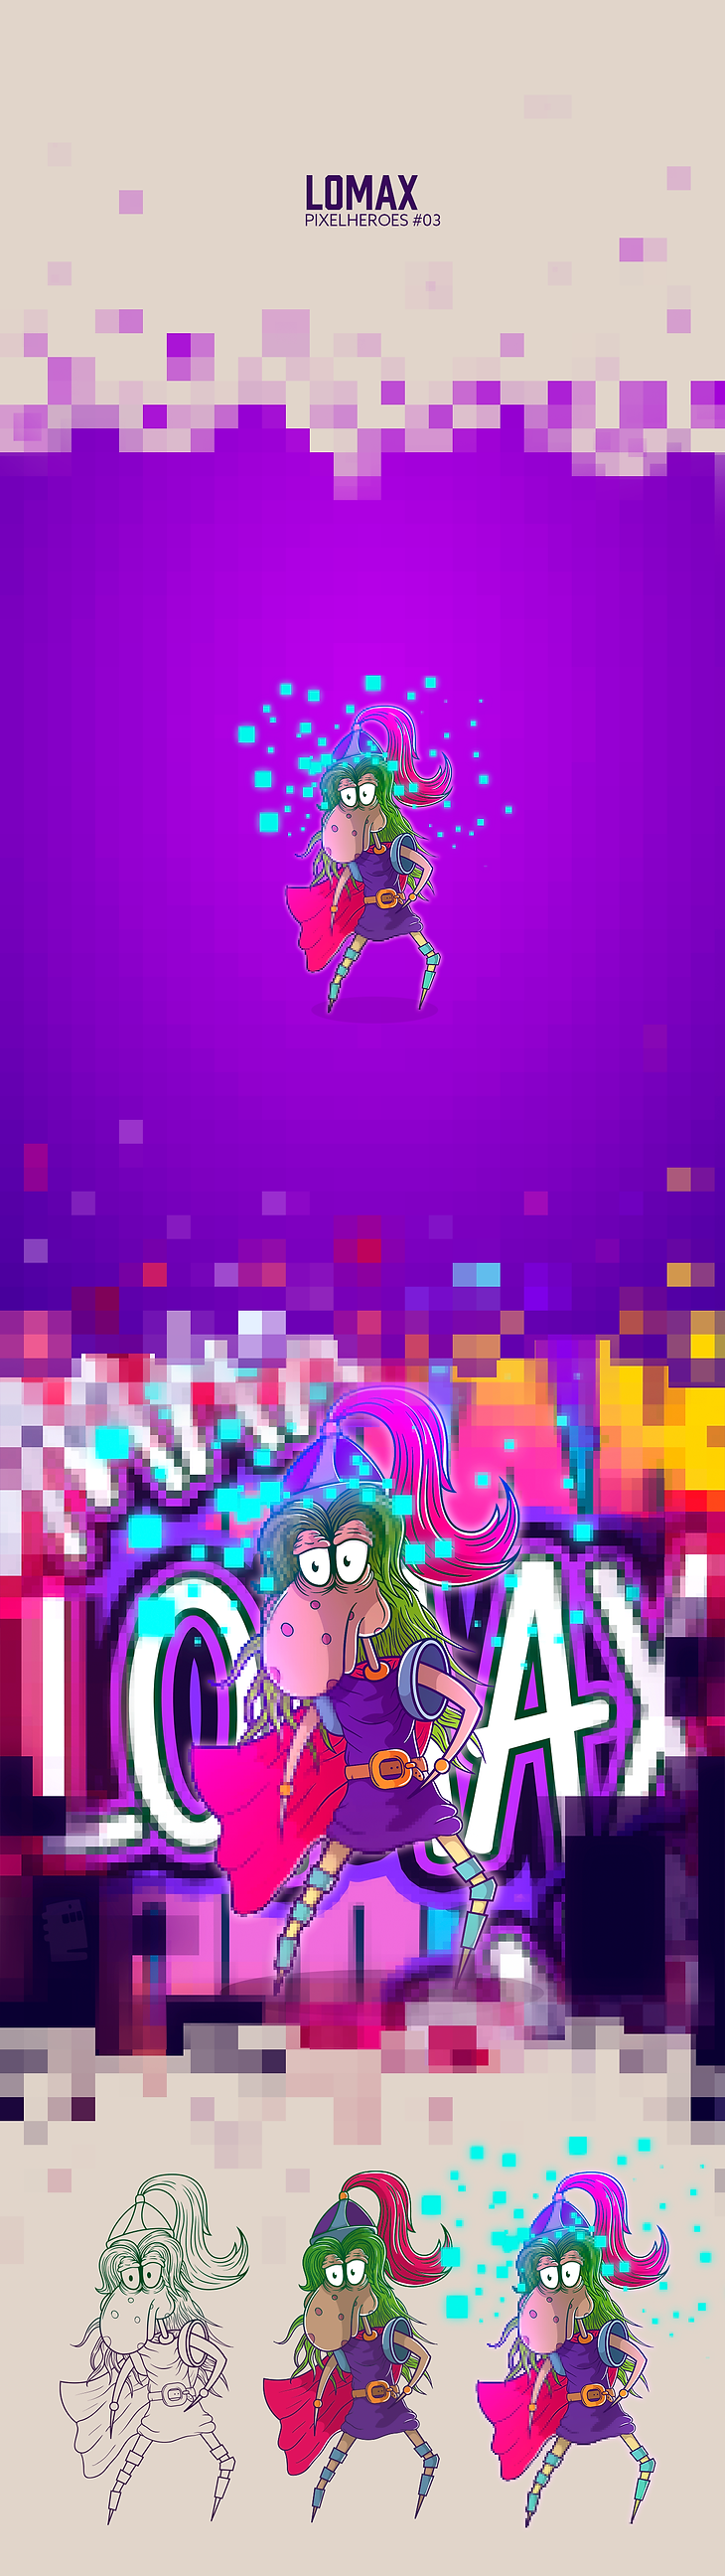 Behance---Pixelheroes-#03---Lomax.png